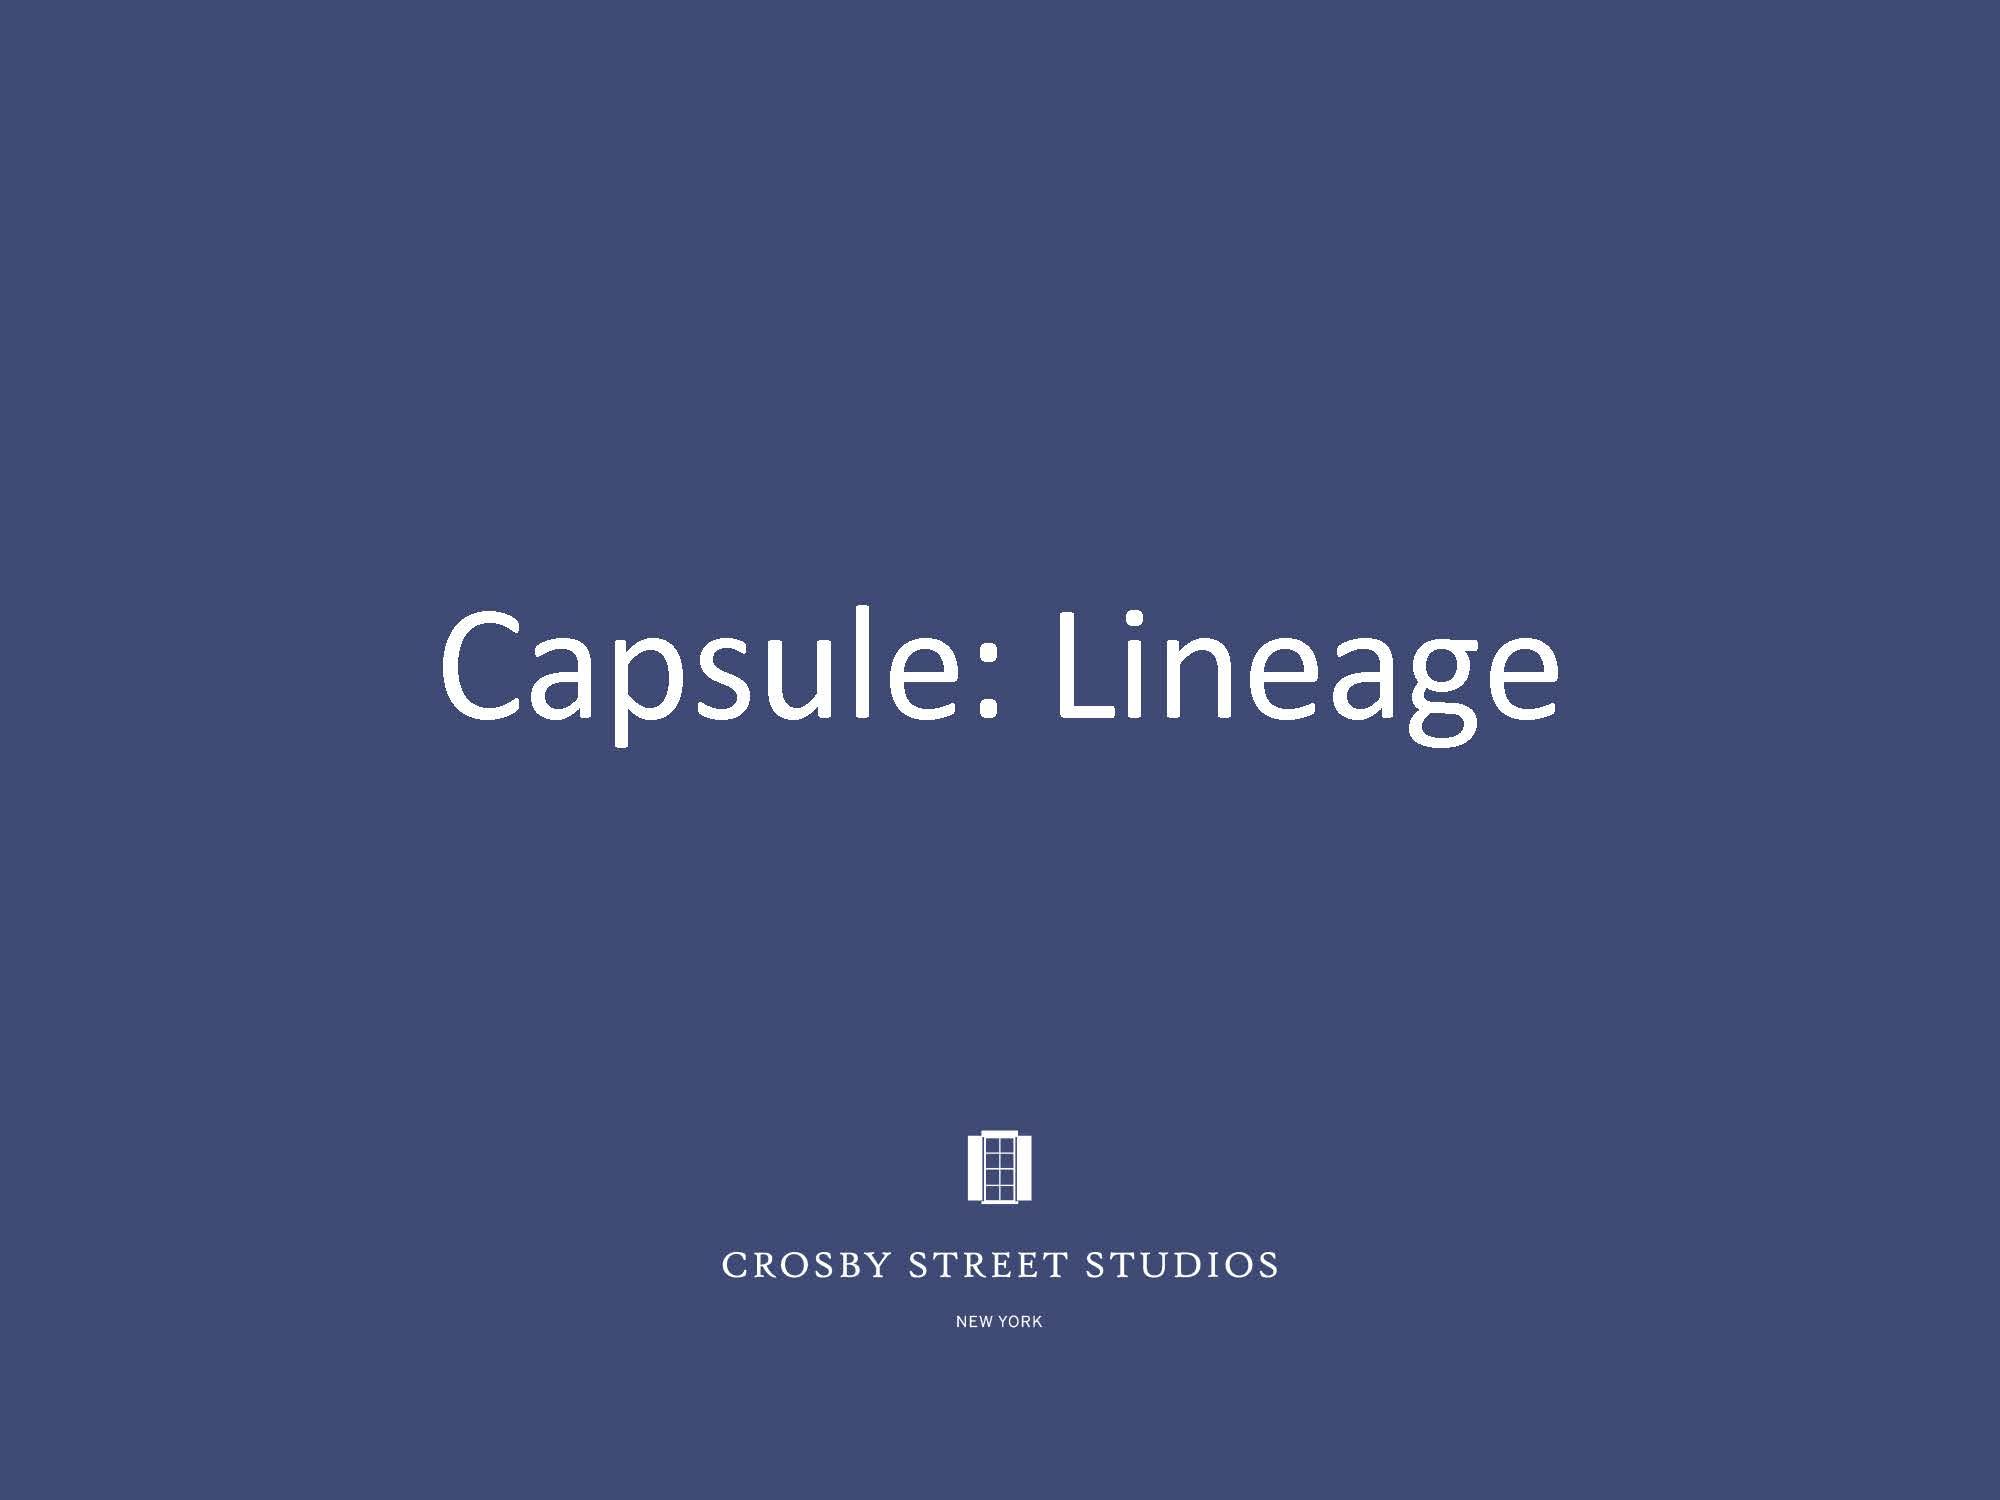 Crosby Street Studio Catalog_Capsule Lineage Cover